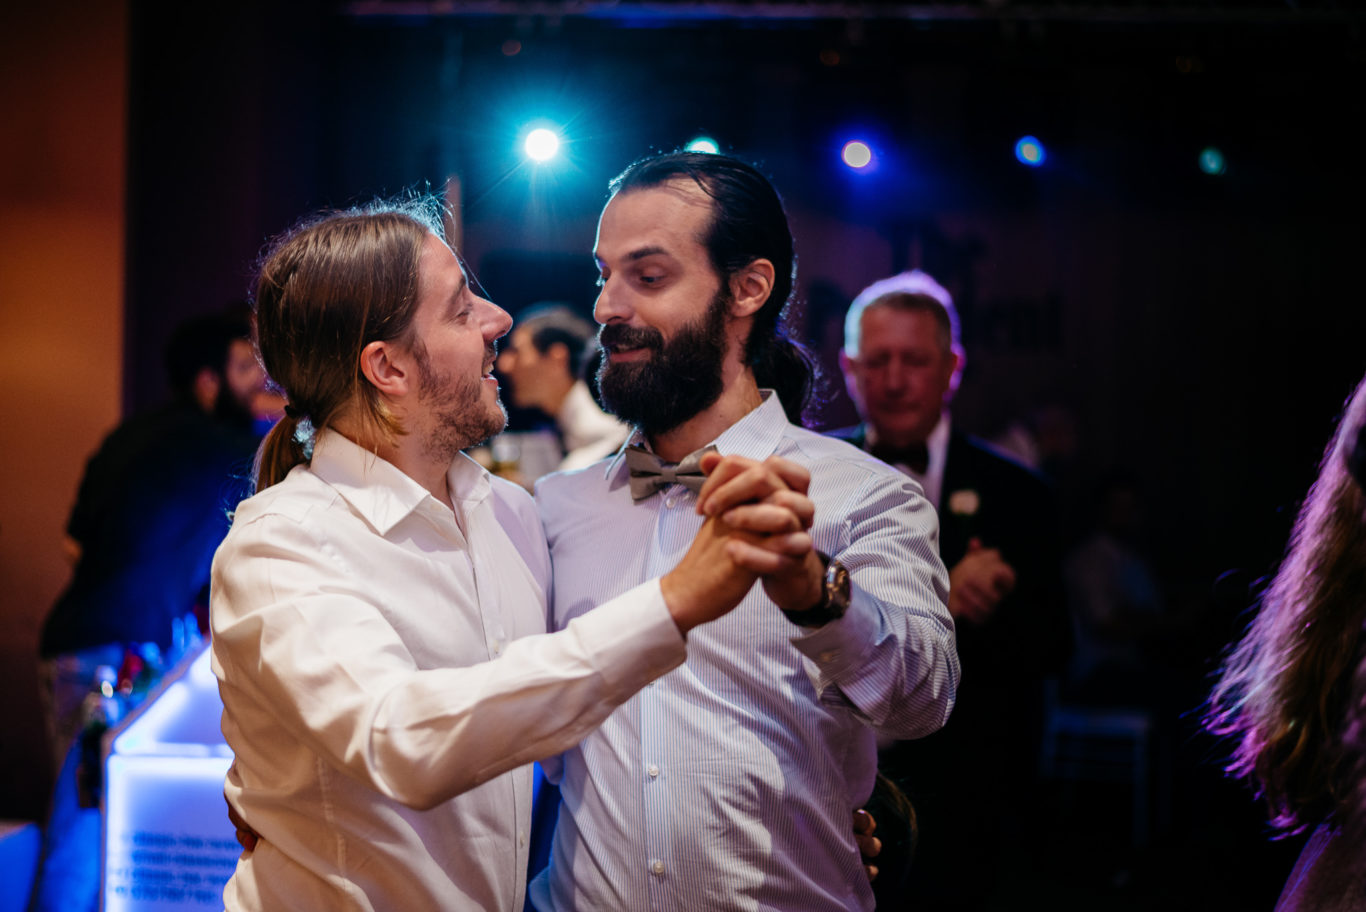 0577-Fotografie-nunta-Bucuresti-Oana-Catalin-fotograf-Ciprian-Dumitrescu-DSC_4757